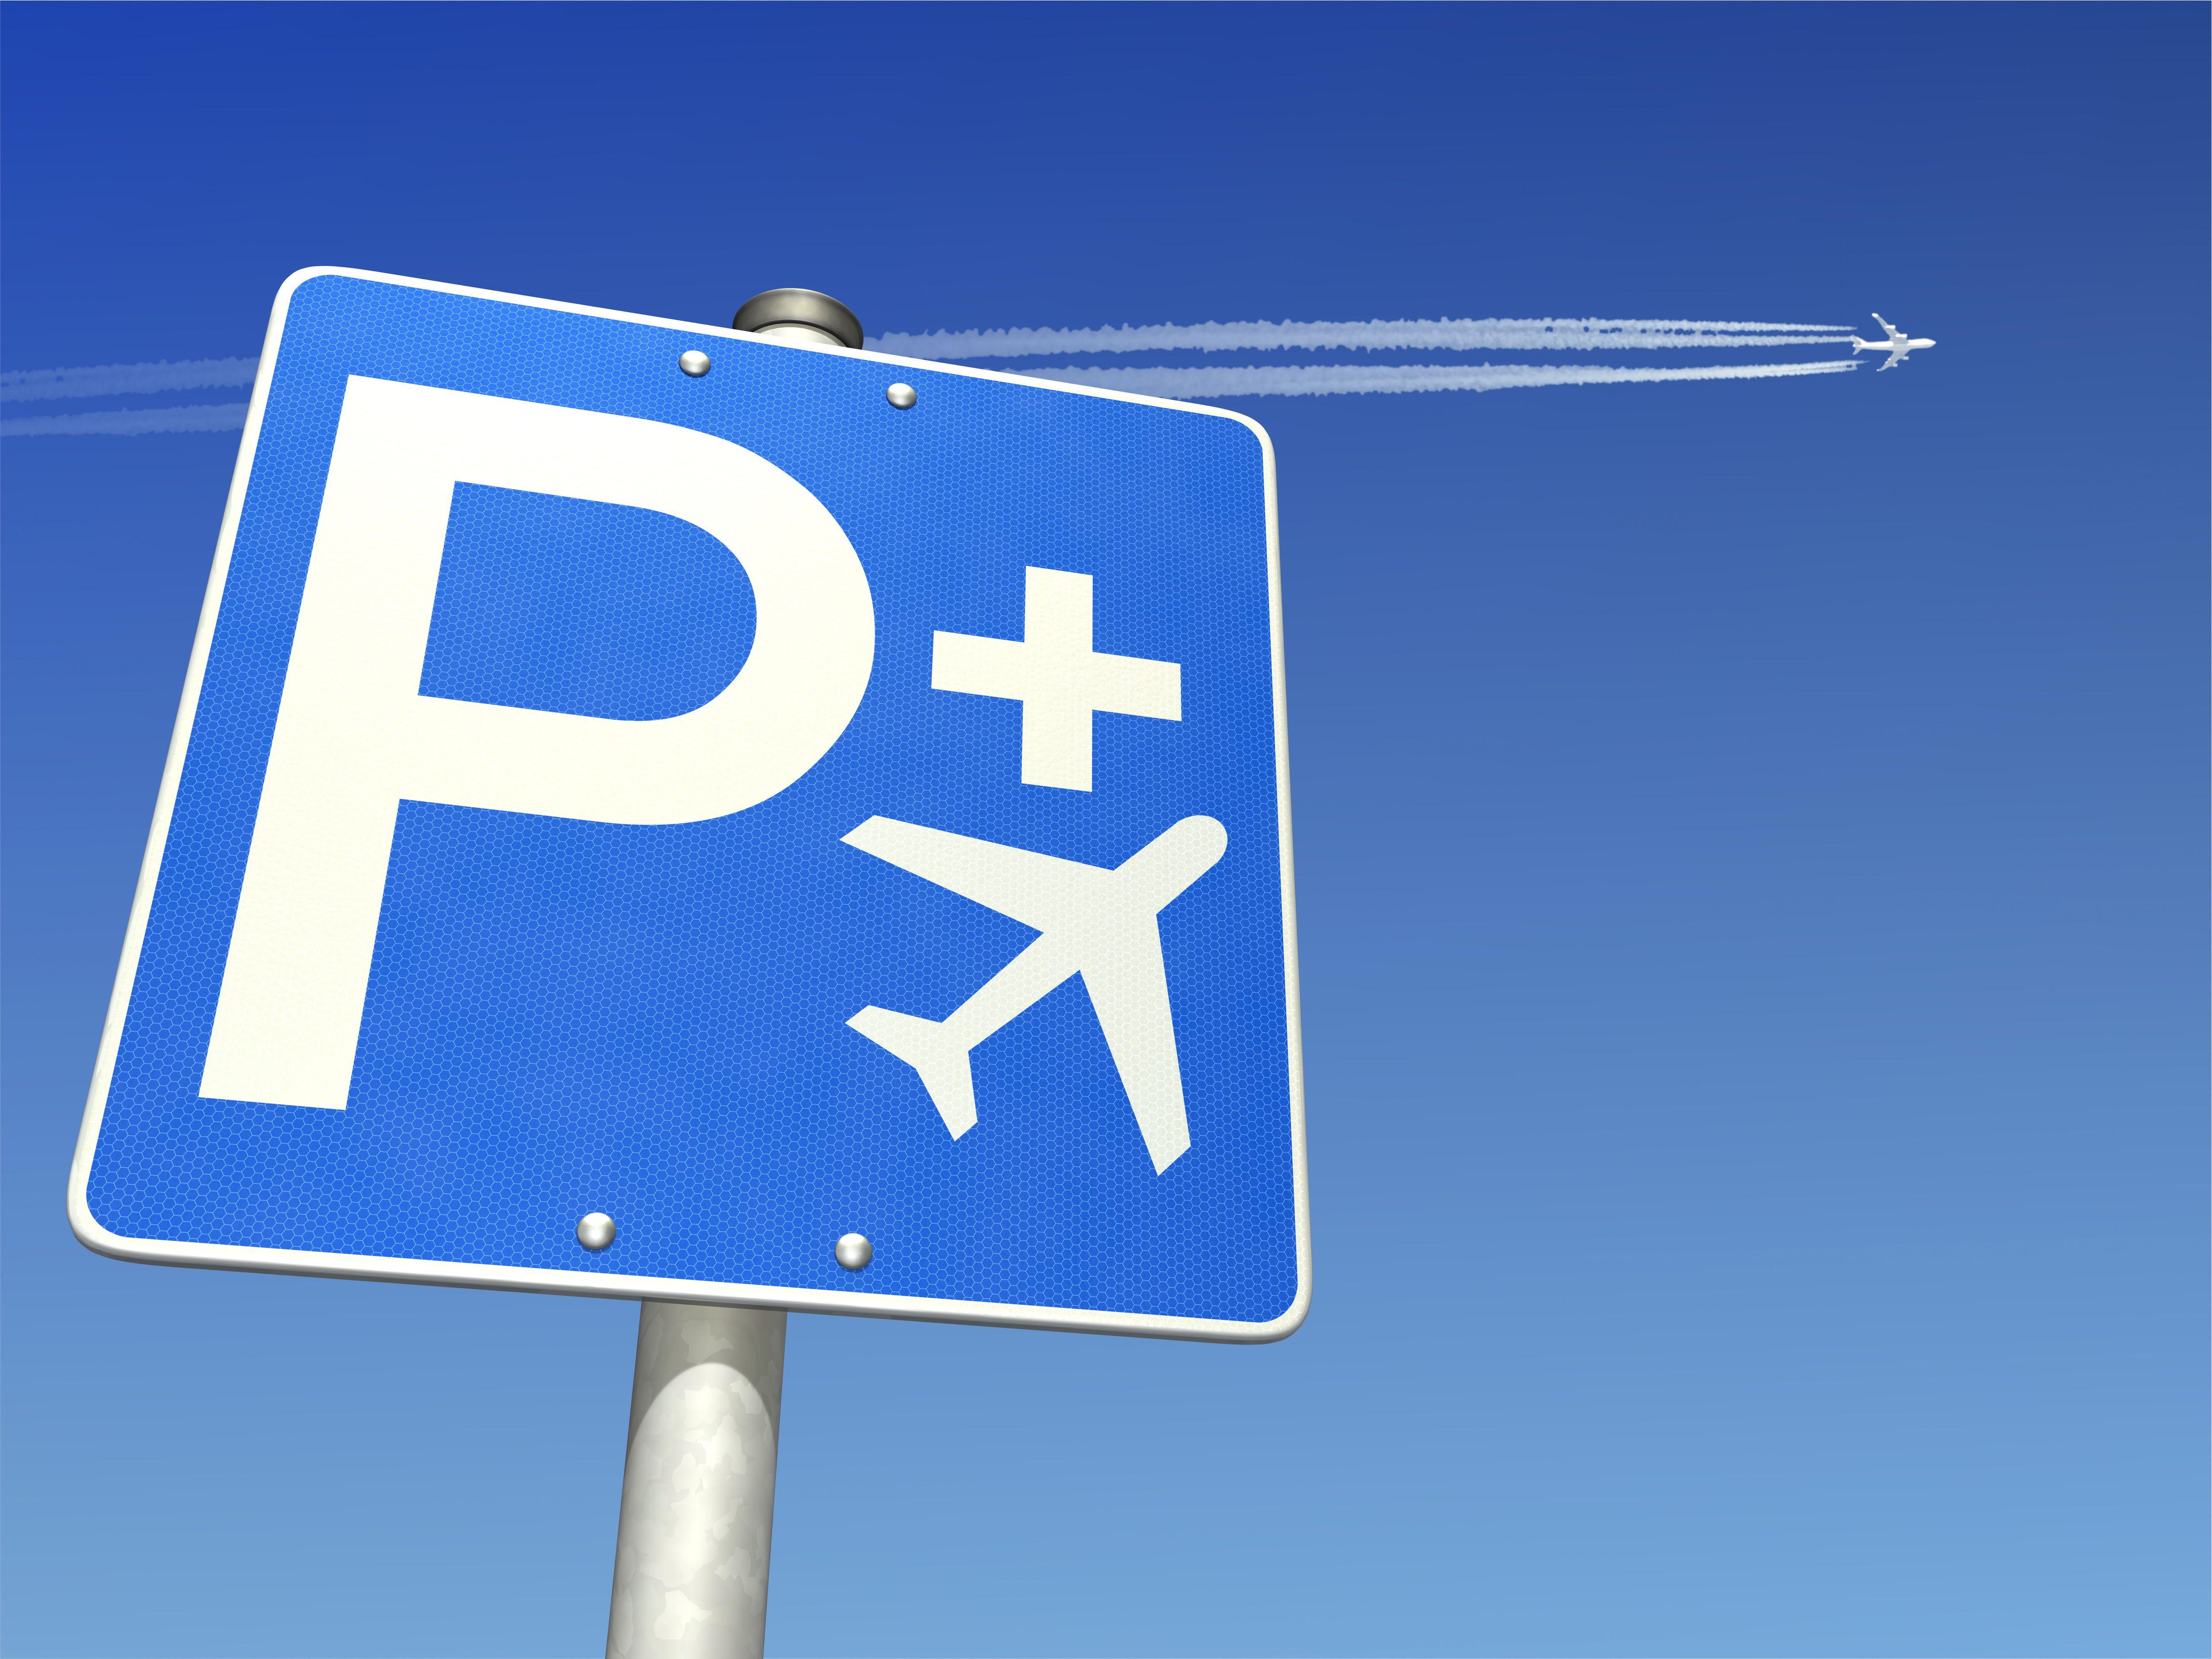 thai hjørring hamborg lufthavn parkering priser